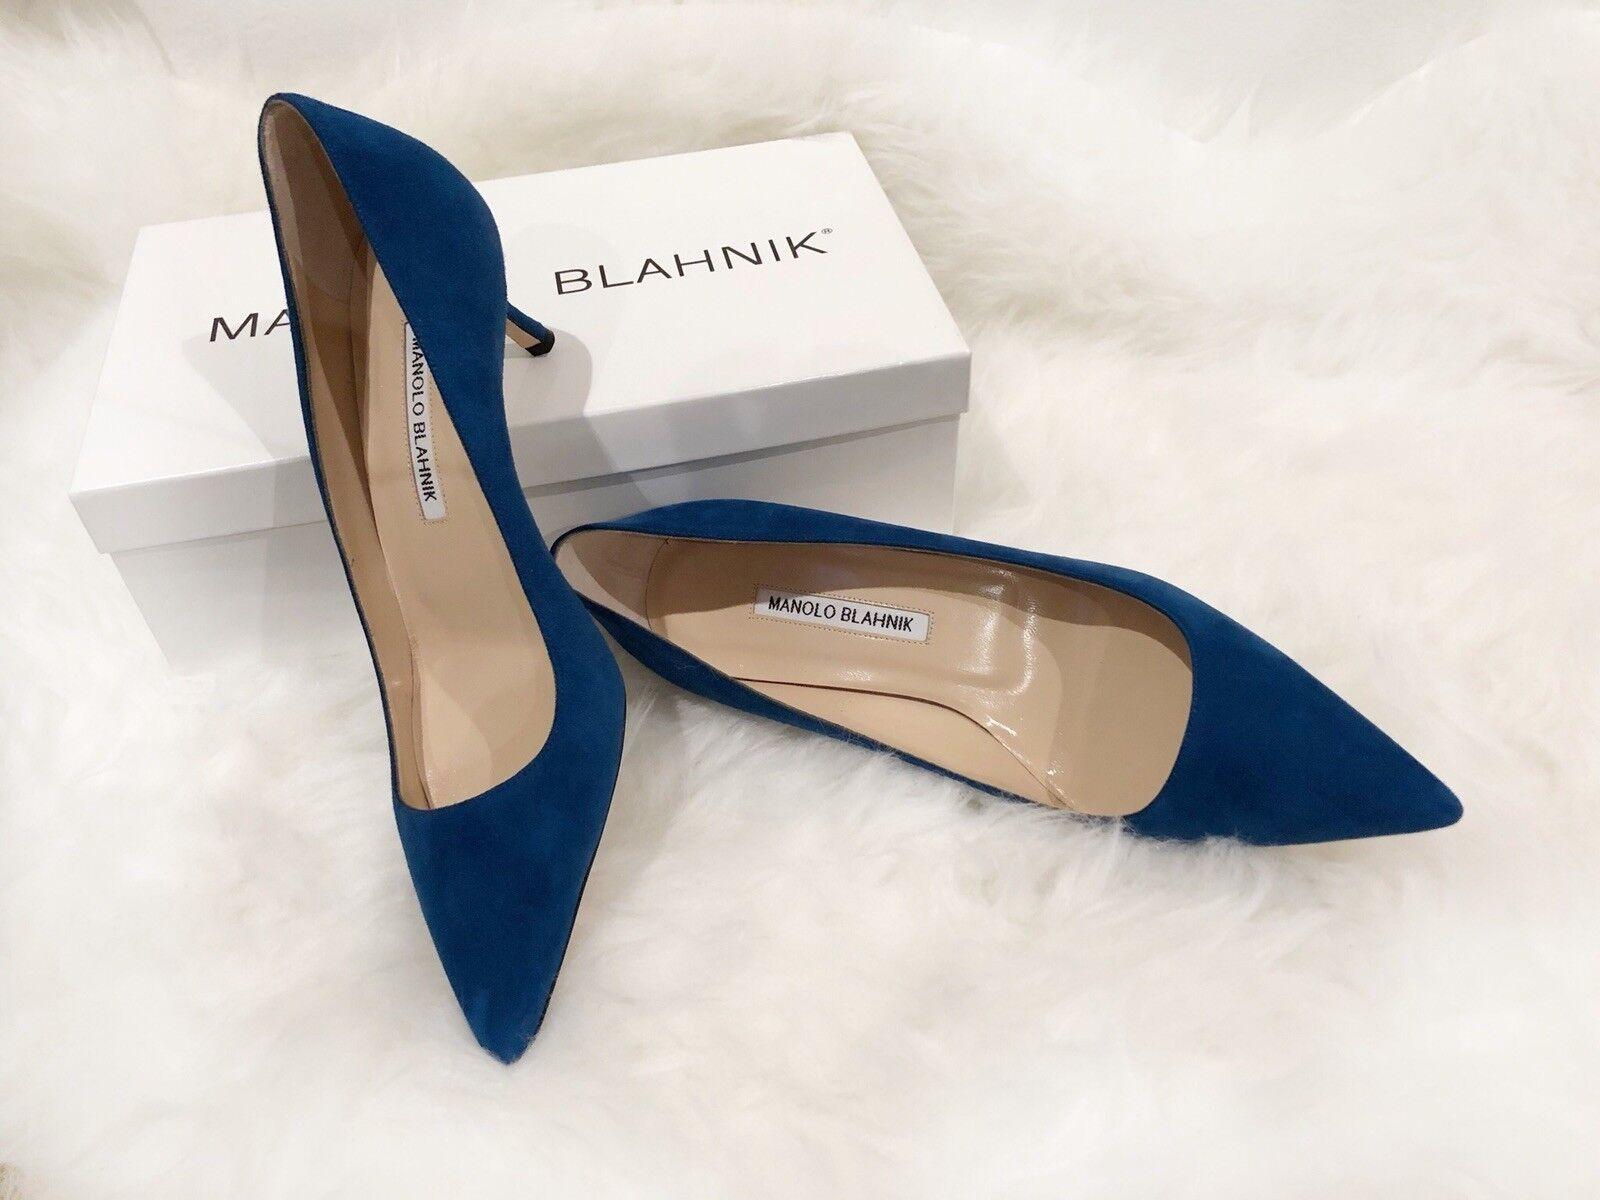 595 NIB Manolo Blahnik bluee Suede Pumps BB 50 Heels Size37.5